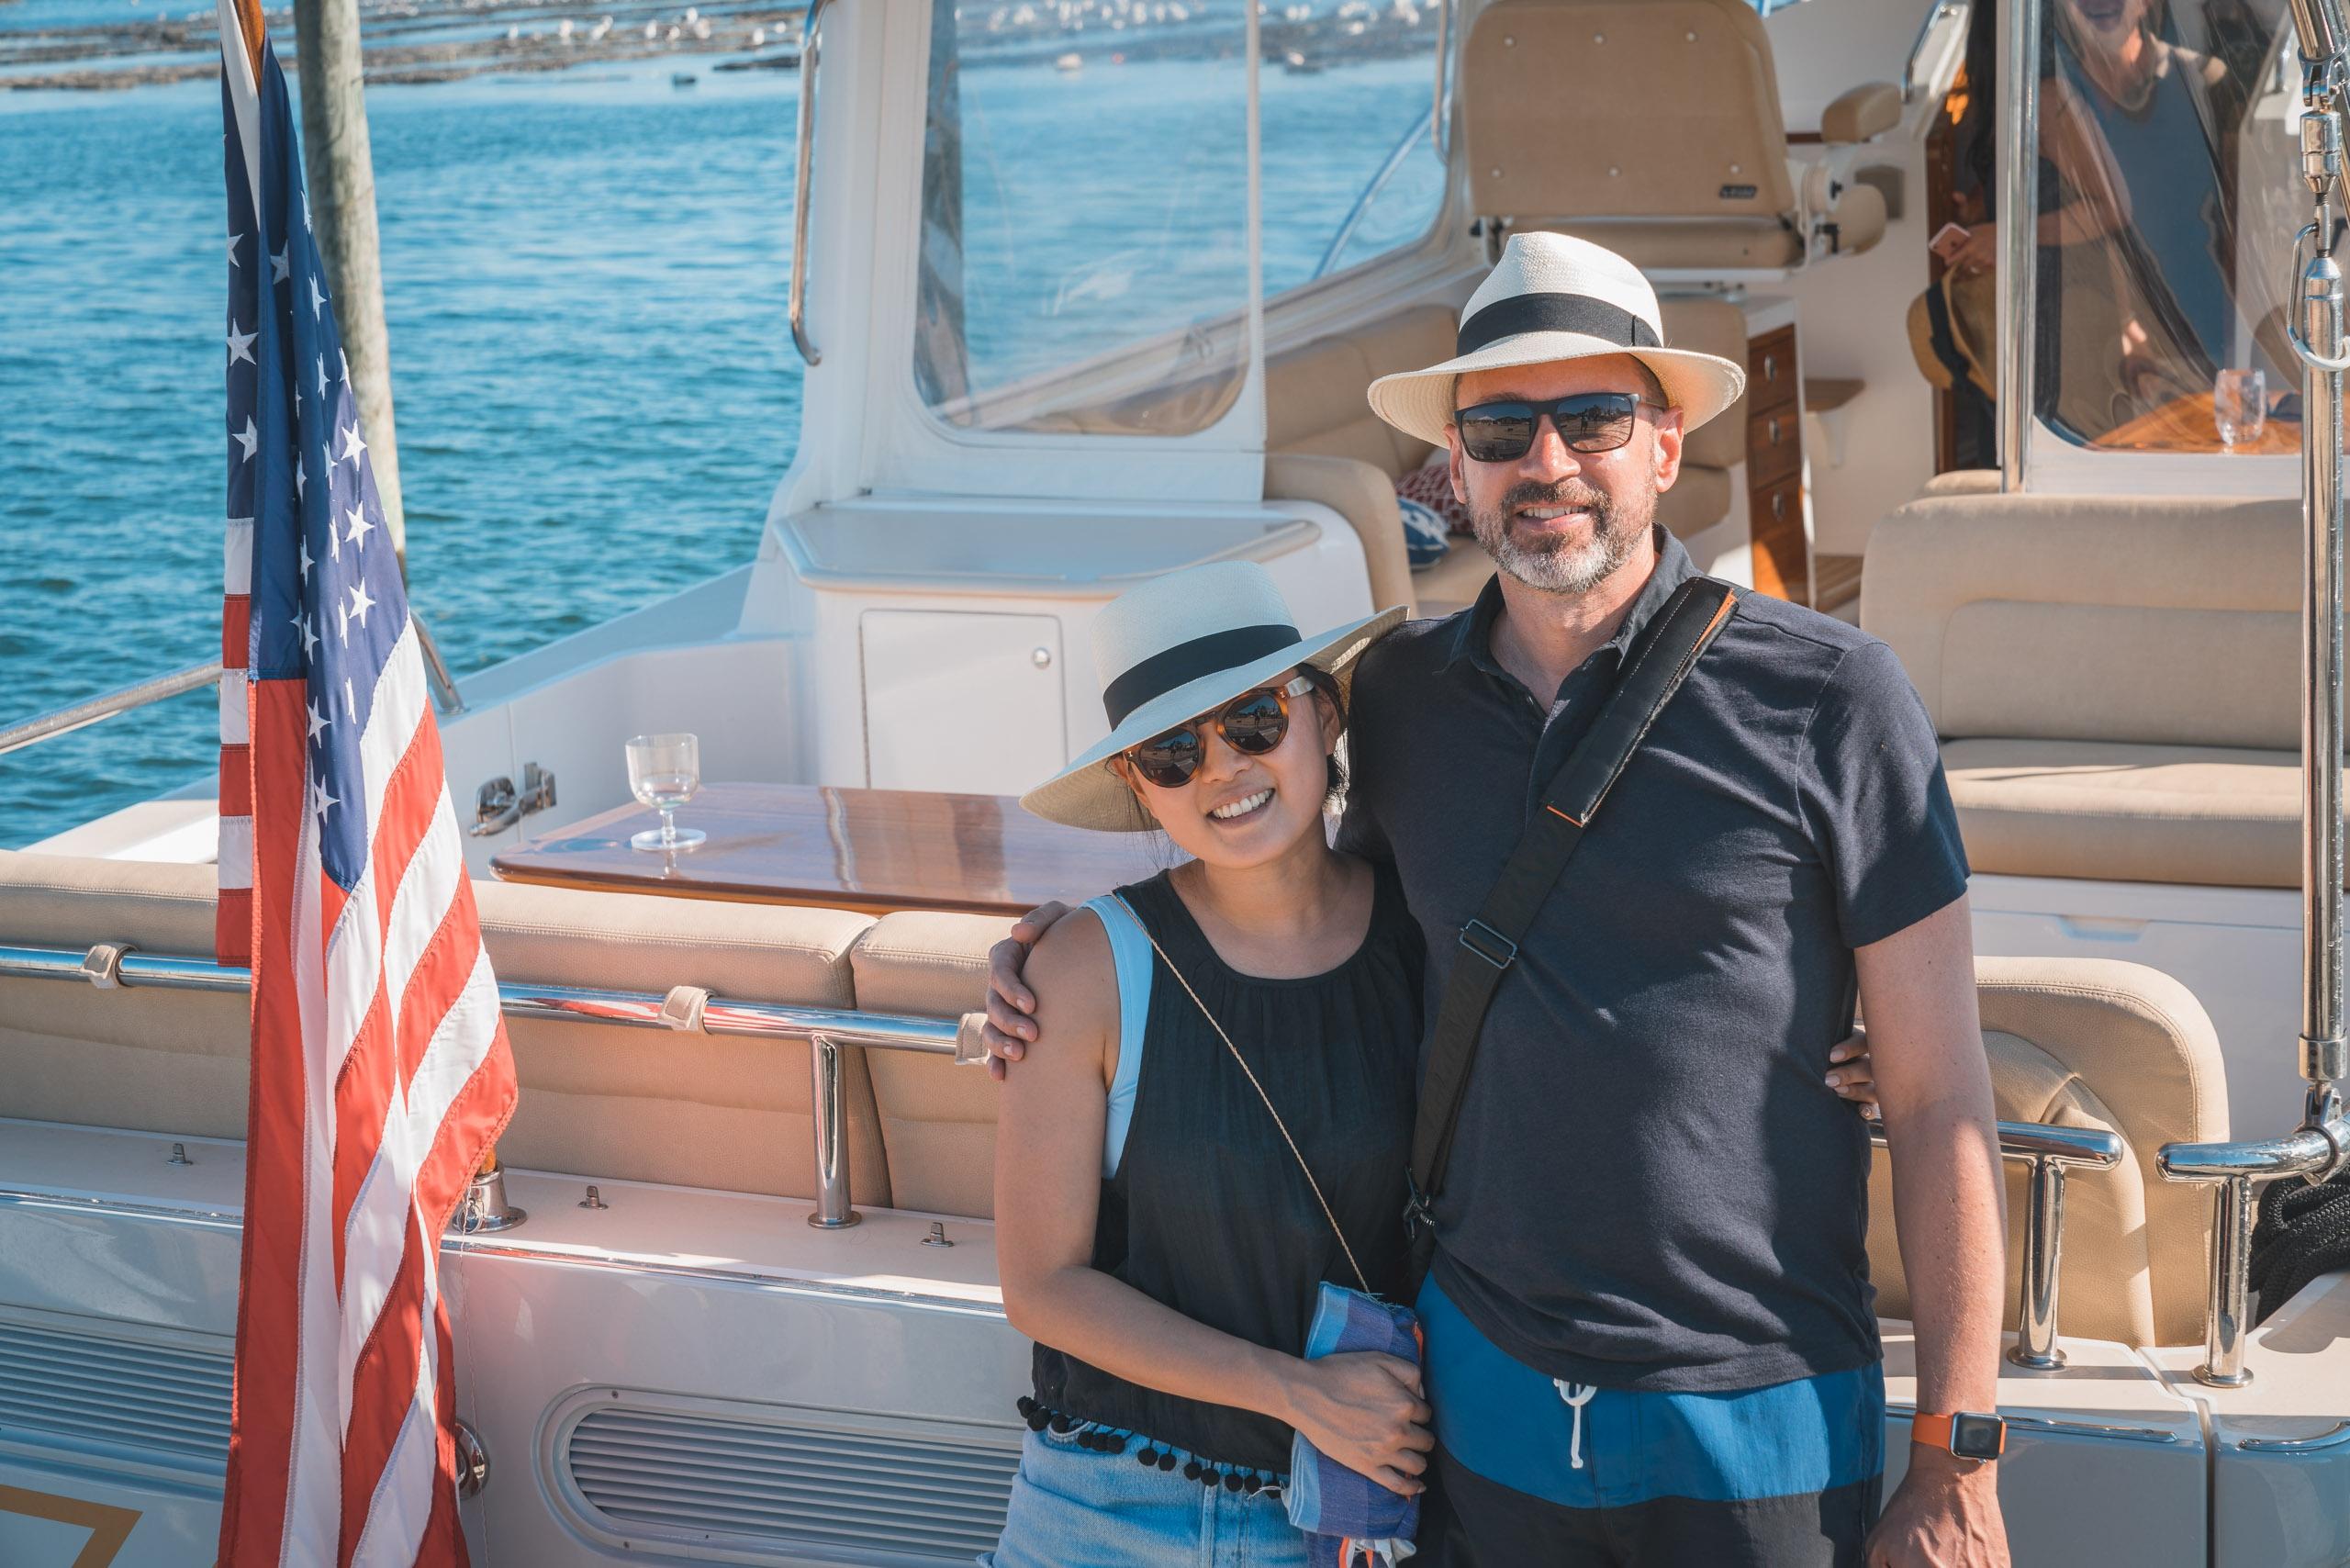 Jessica and Kris Arrive in Montauk